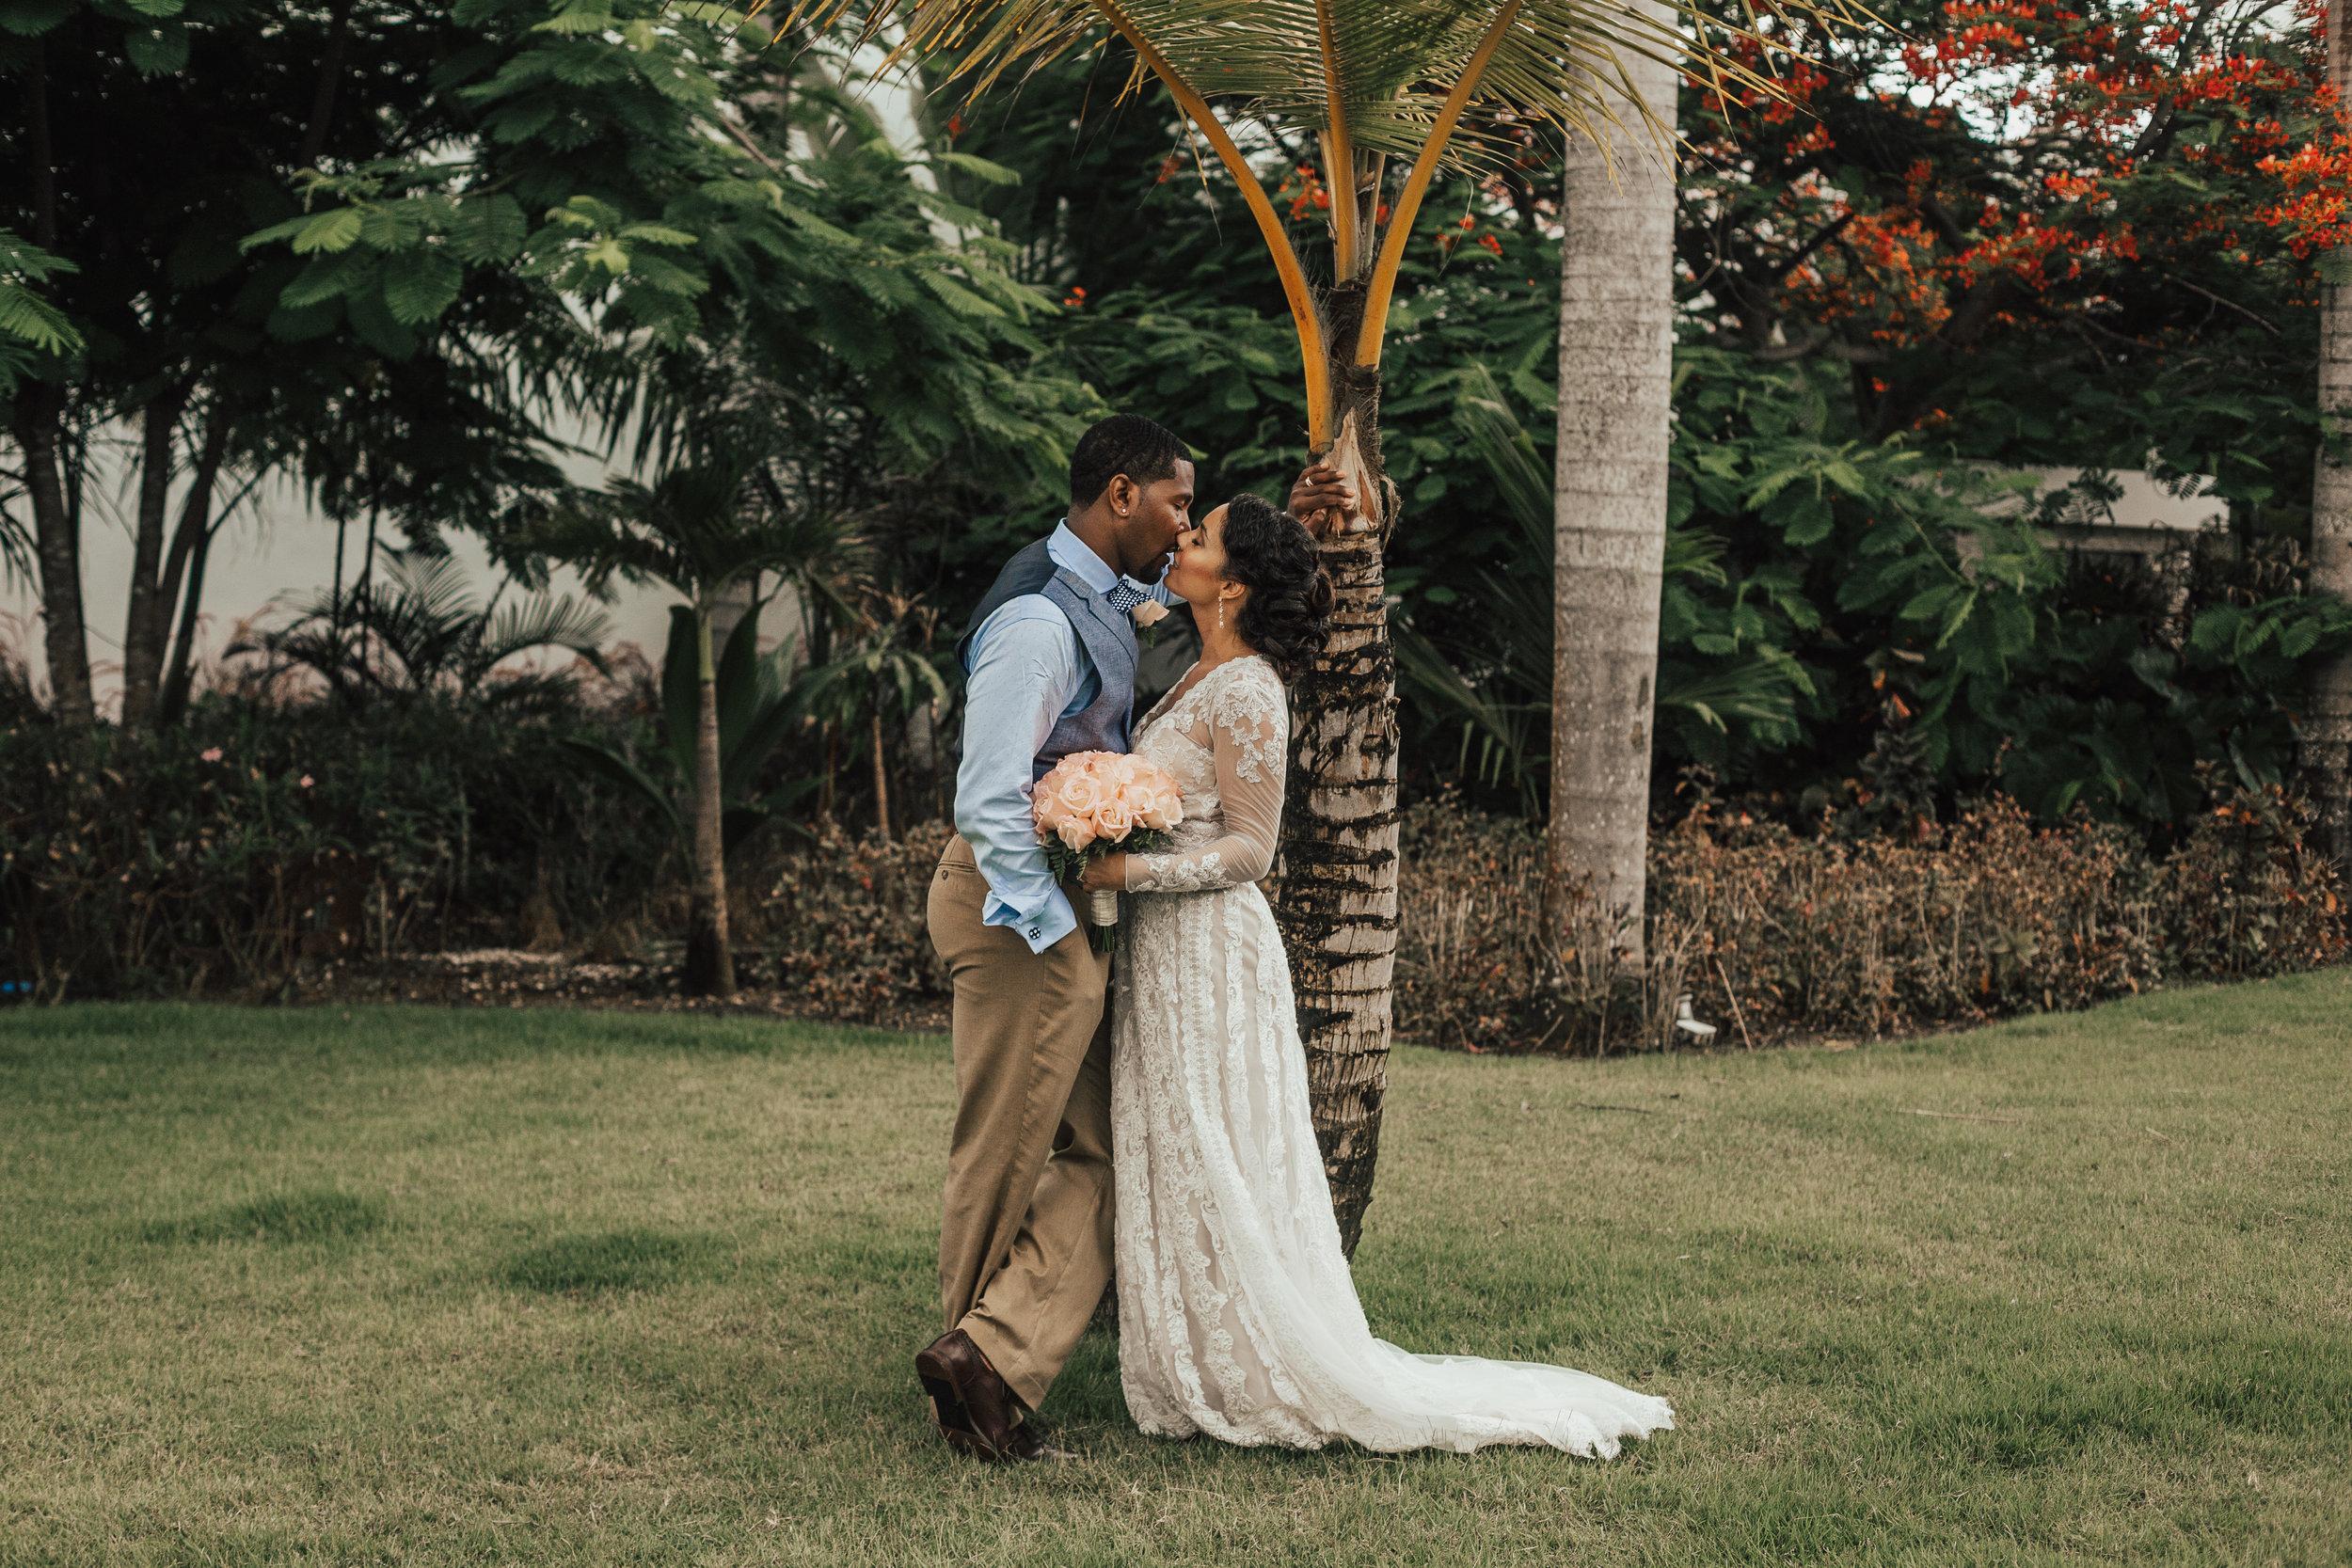 destination-wedding-punta-cana-blog-mariah-lillian-photography-chic-resort